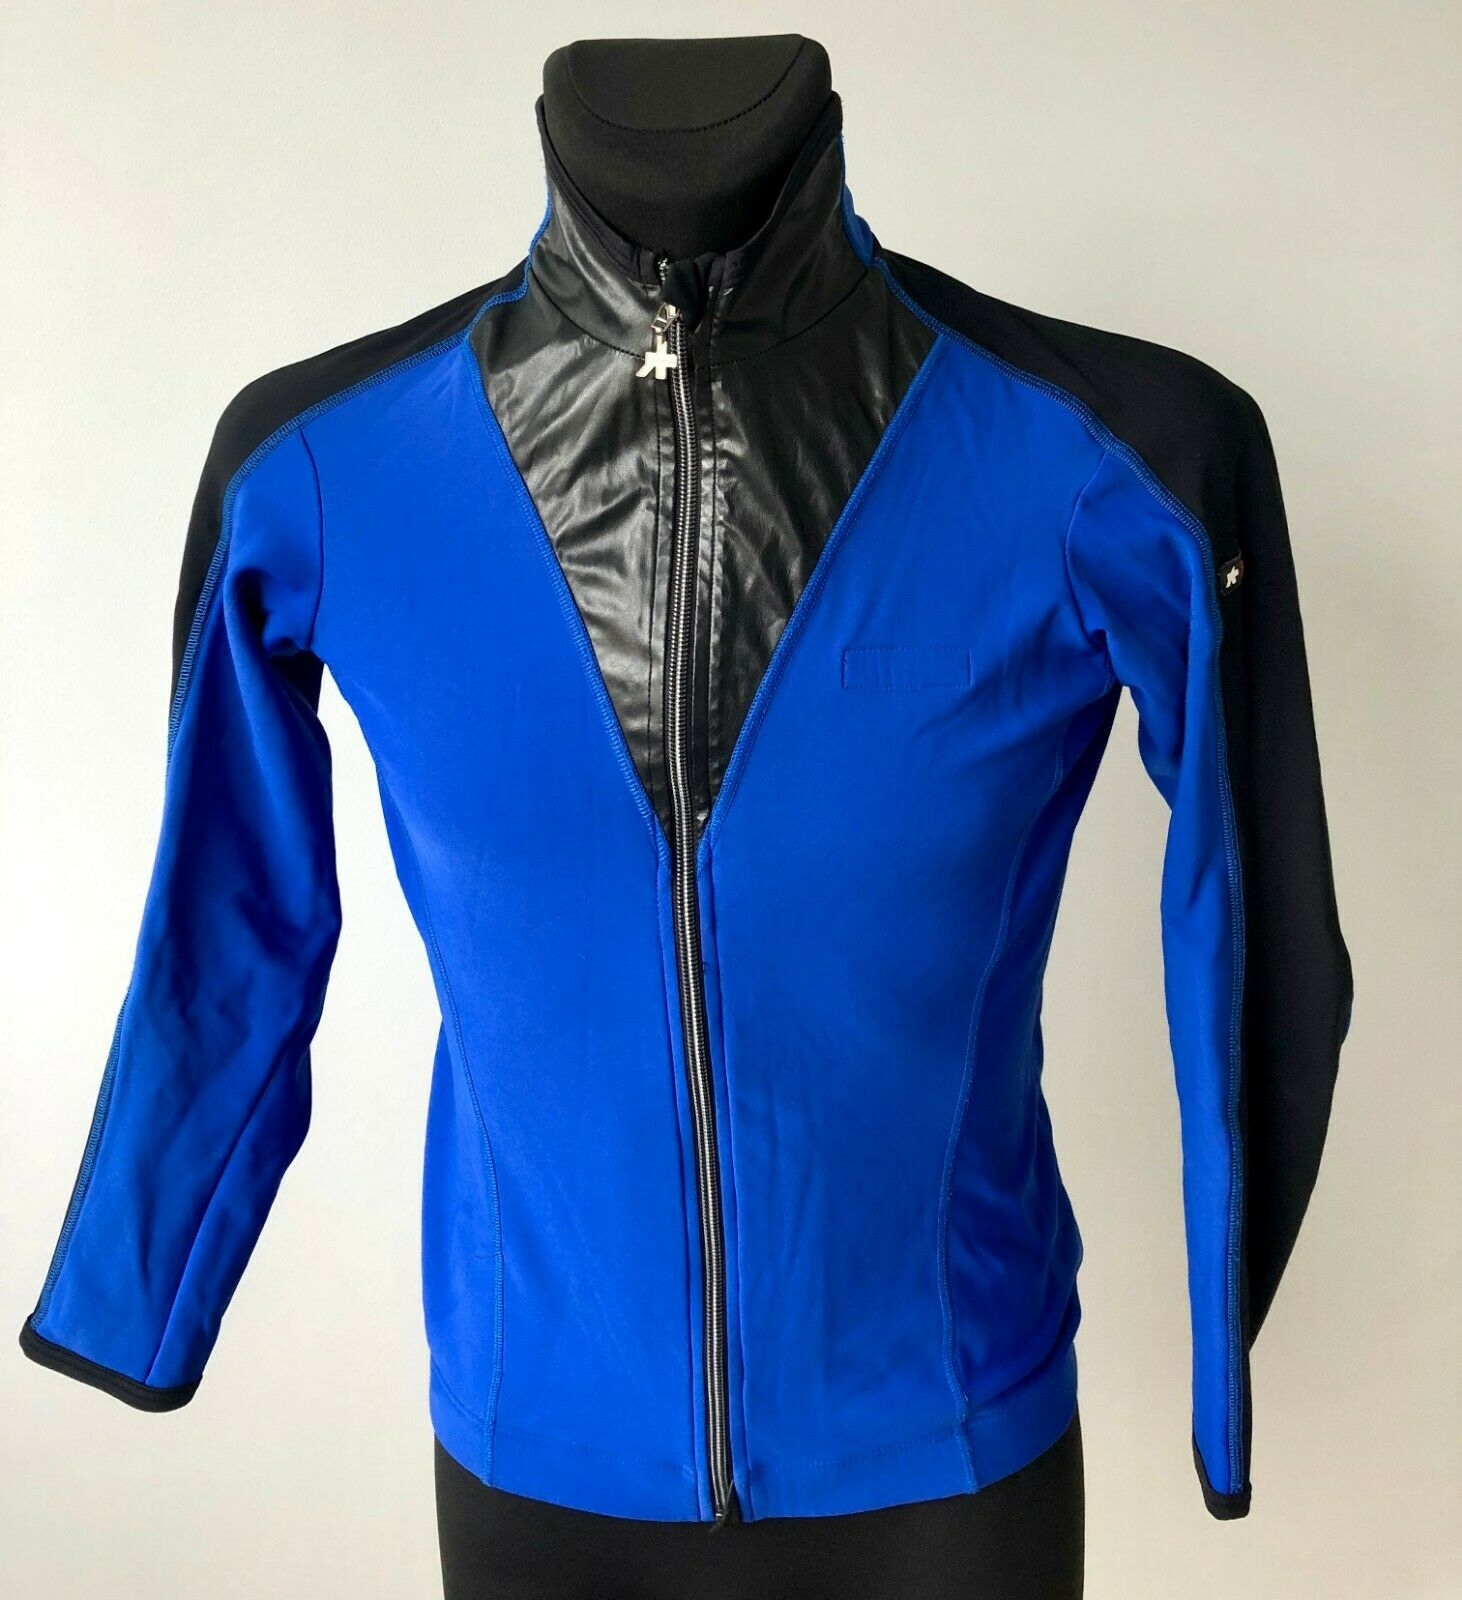 Assos Cycling Jacket Men's Talla XL